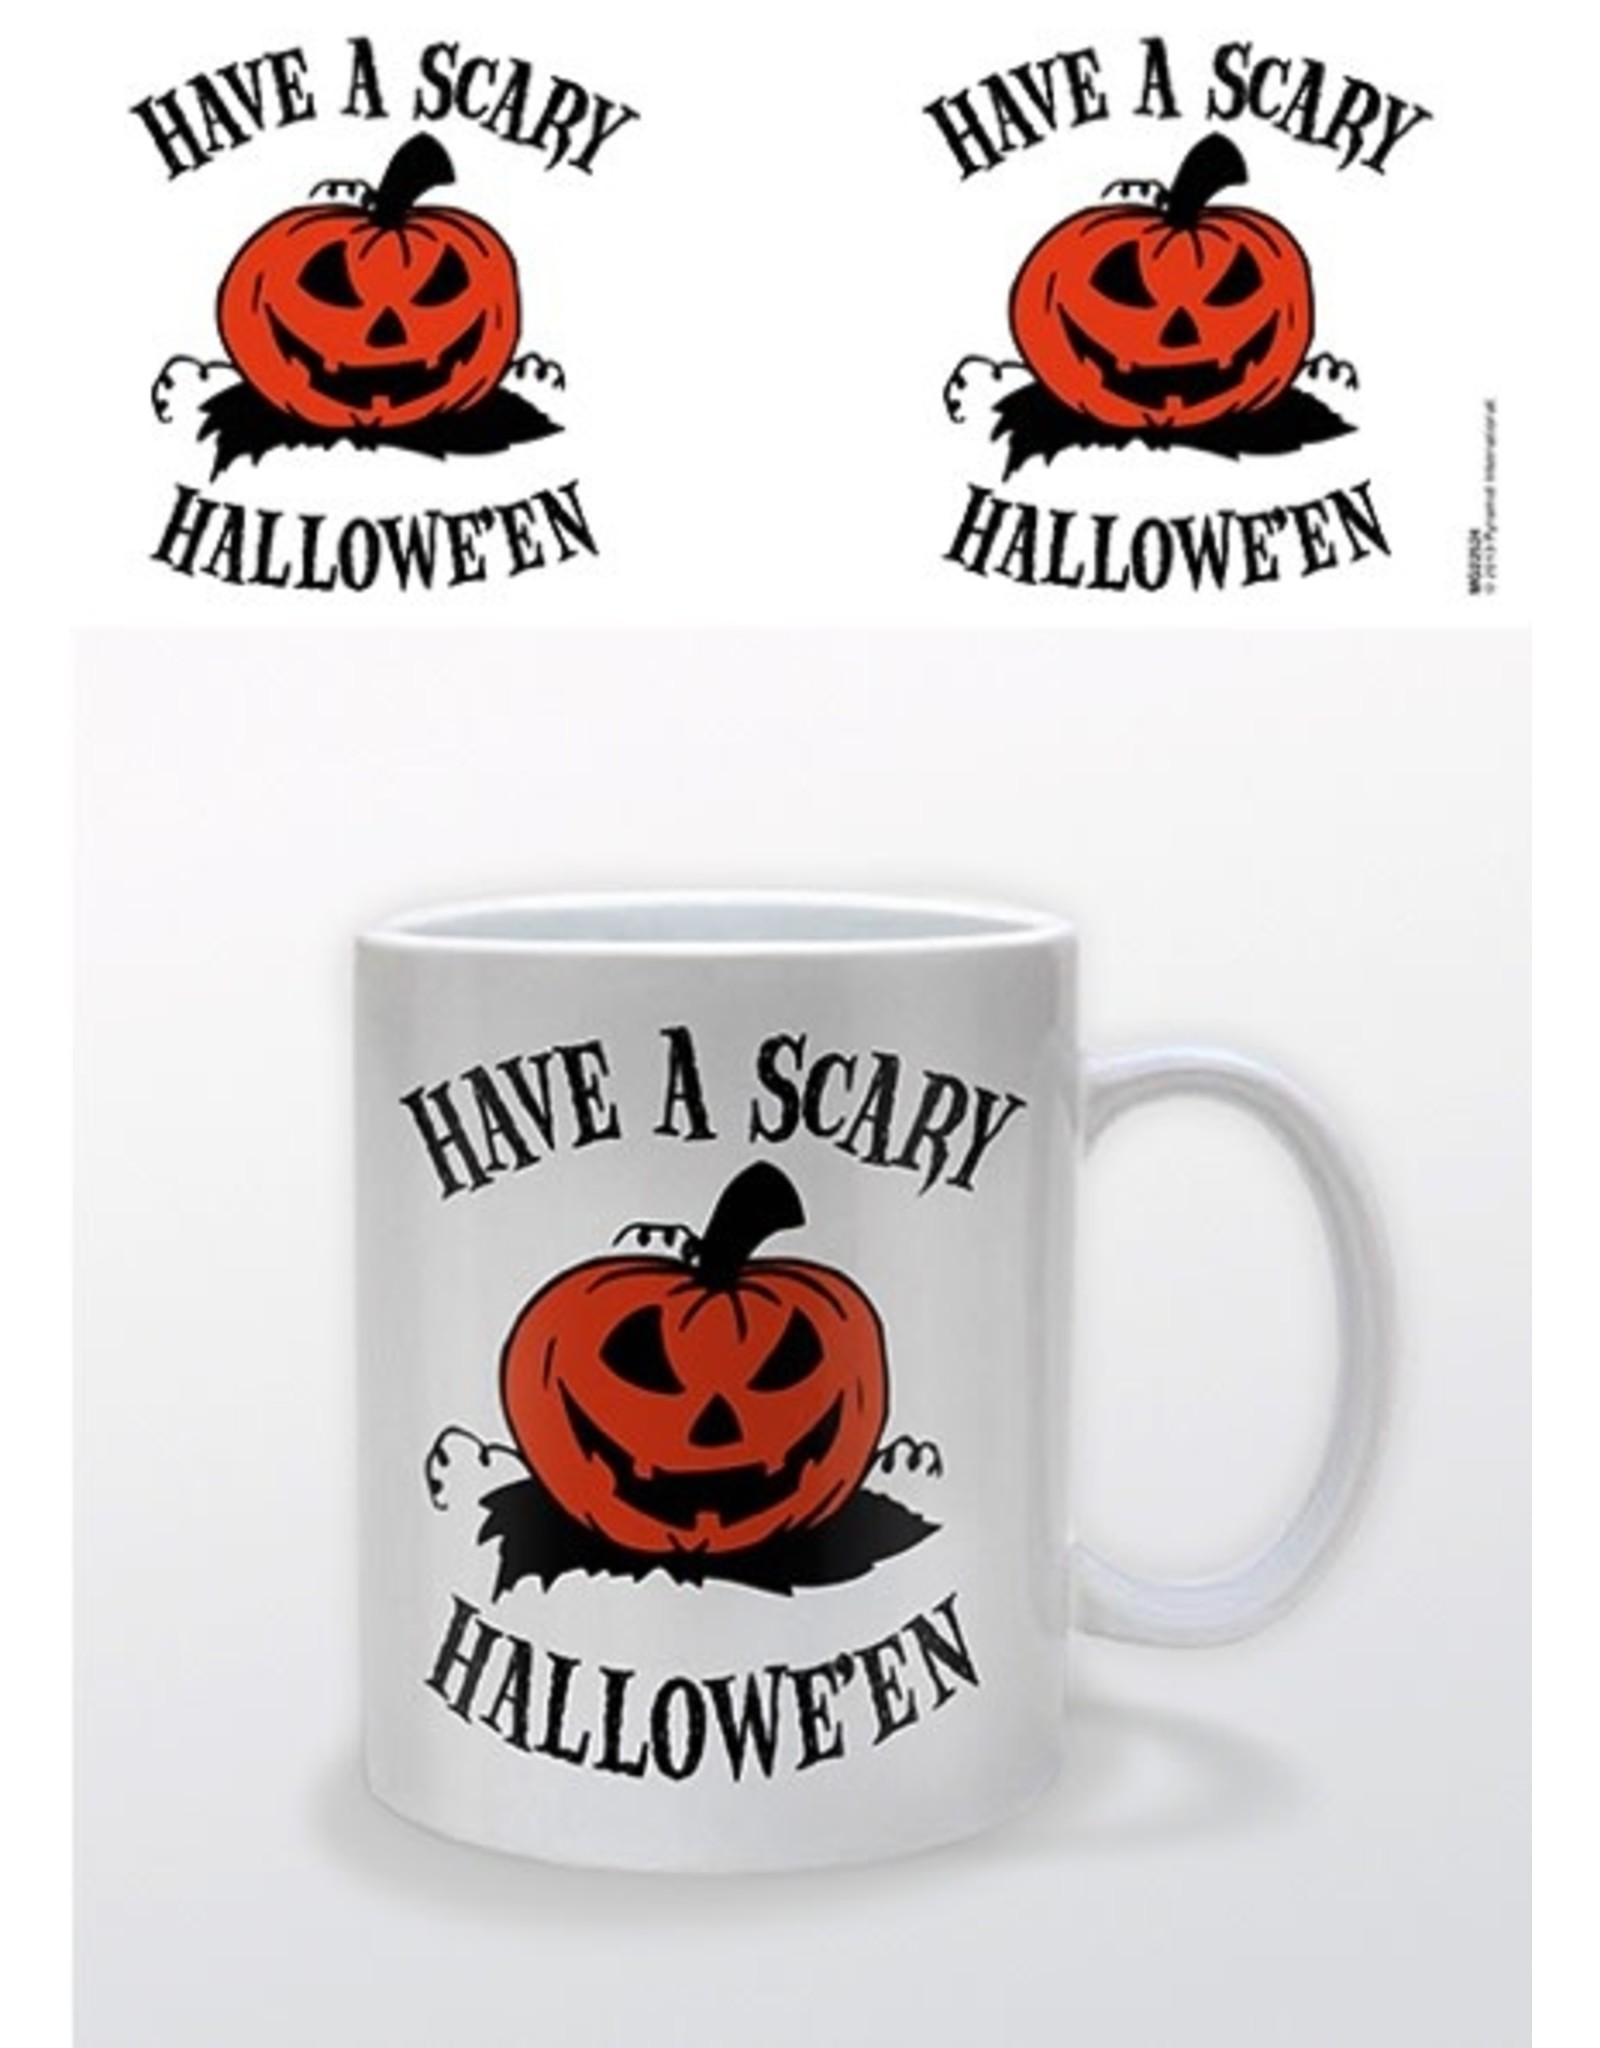 HALLOWEEN Mug 300 ml - Scary